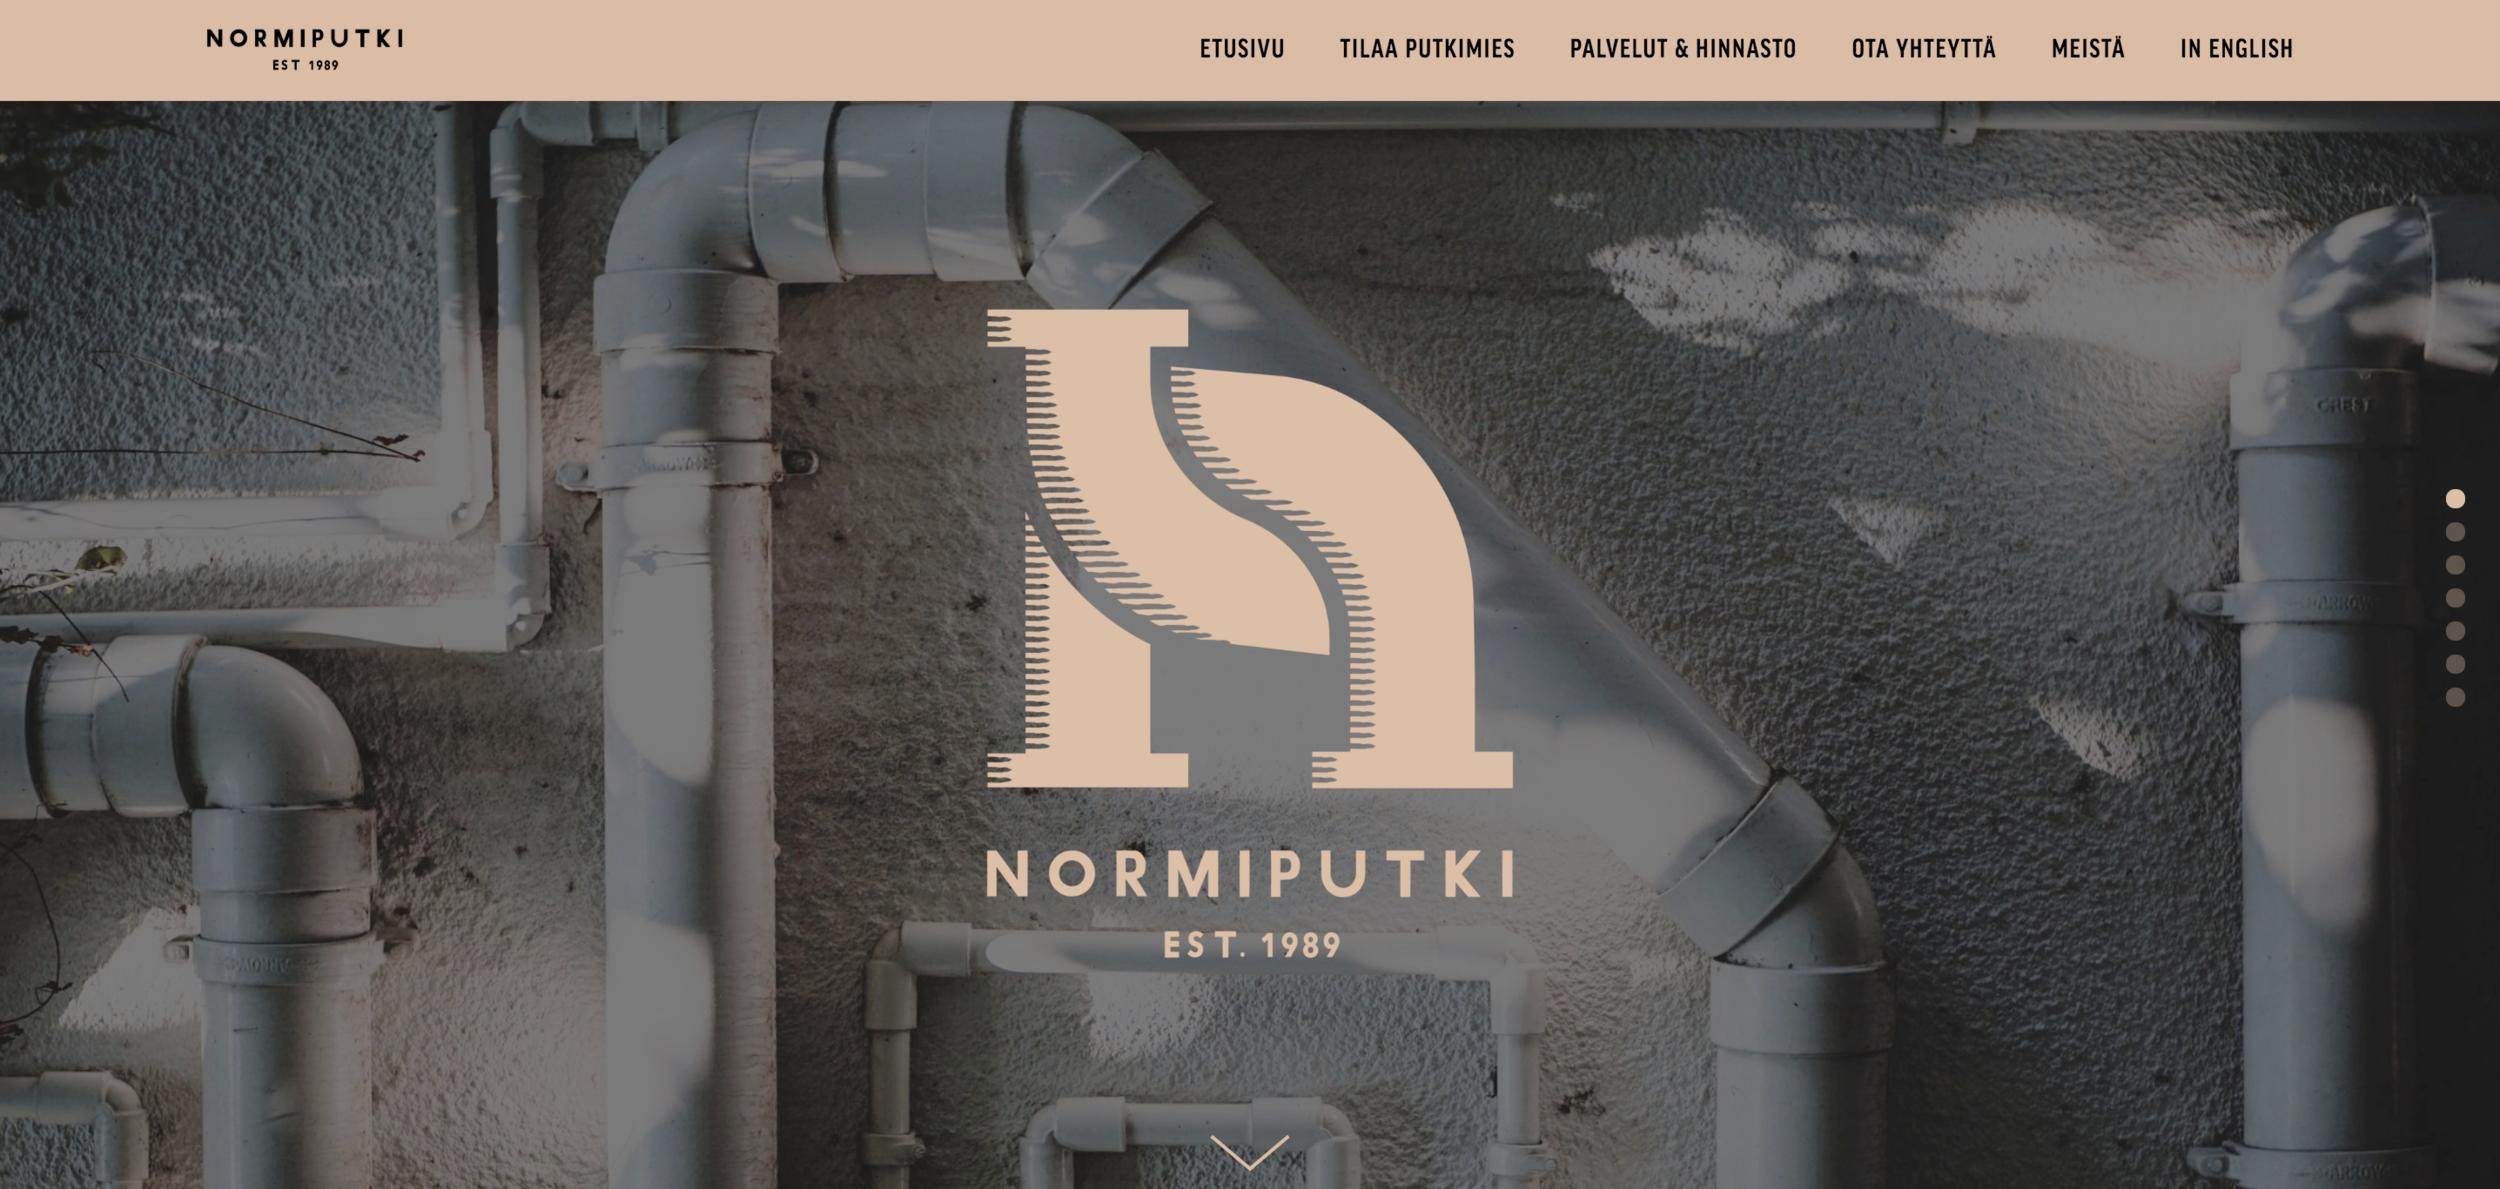 normiputki_etusivu